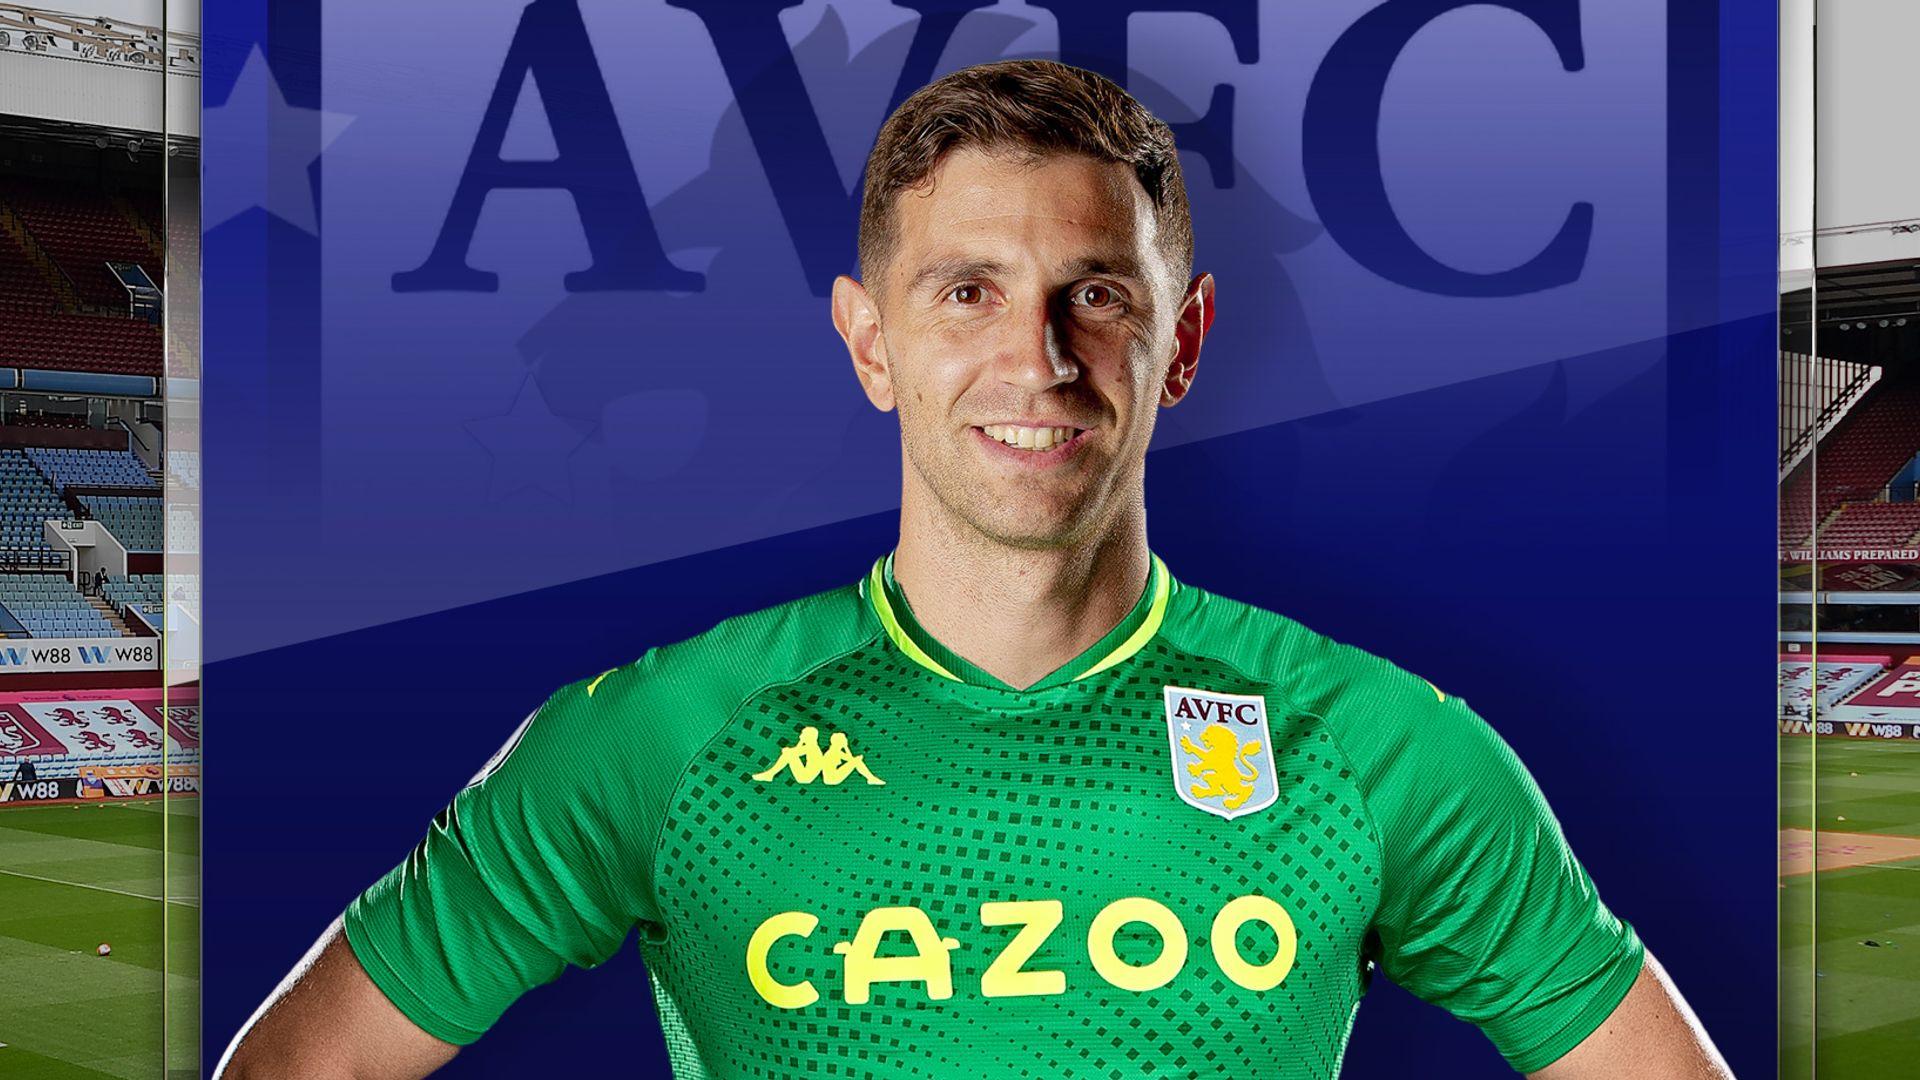 Martinez out to repay Aston Villa's trust